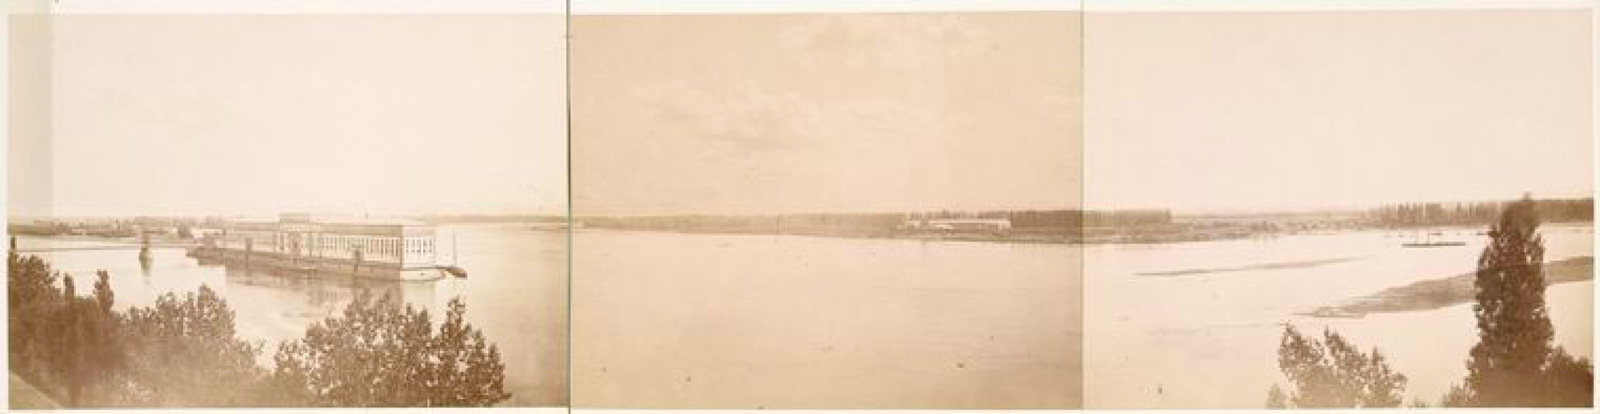 17. Левый берег реки Висла при впадении в нее реки Нарева. Вид из крепости